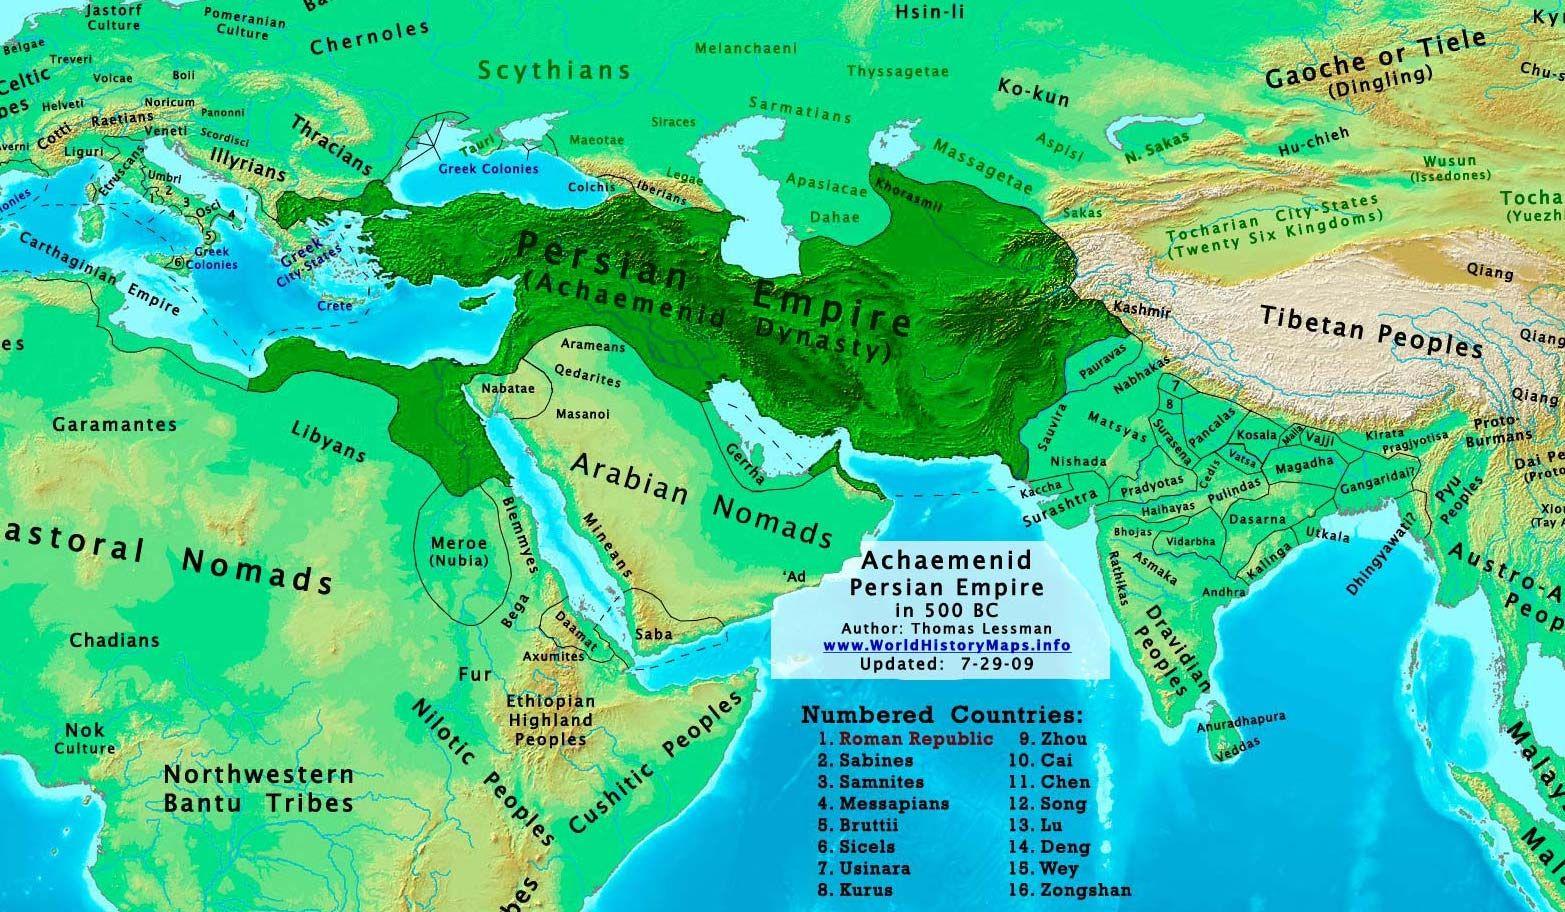 De Pers Achaemenid İmparatorluğu Haritalar Pinterest - Map of egypt 500 bc